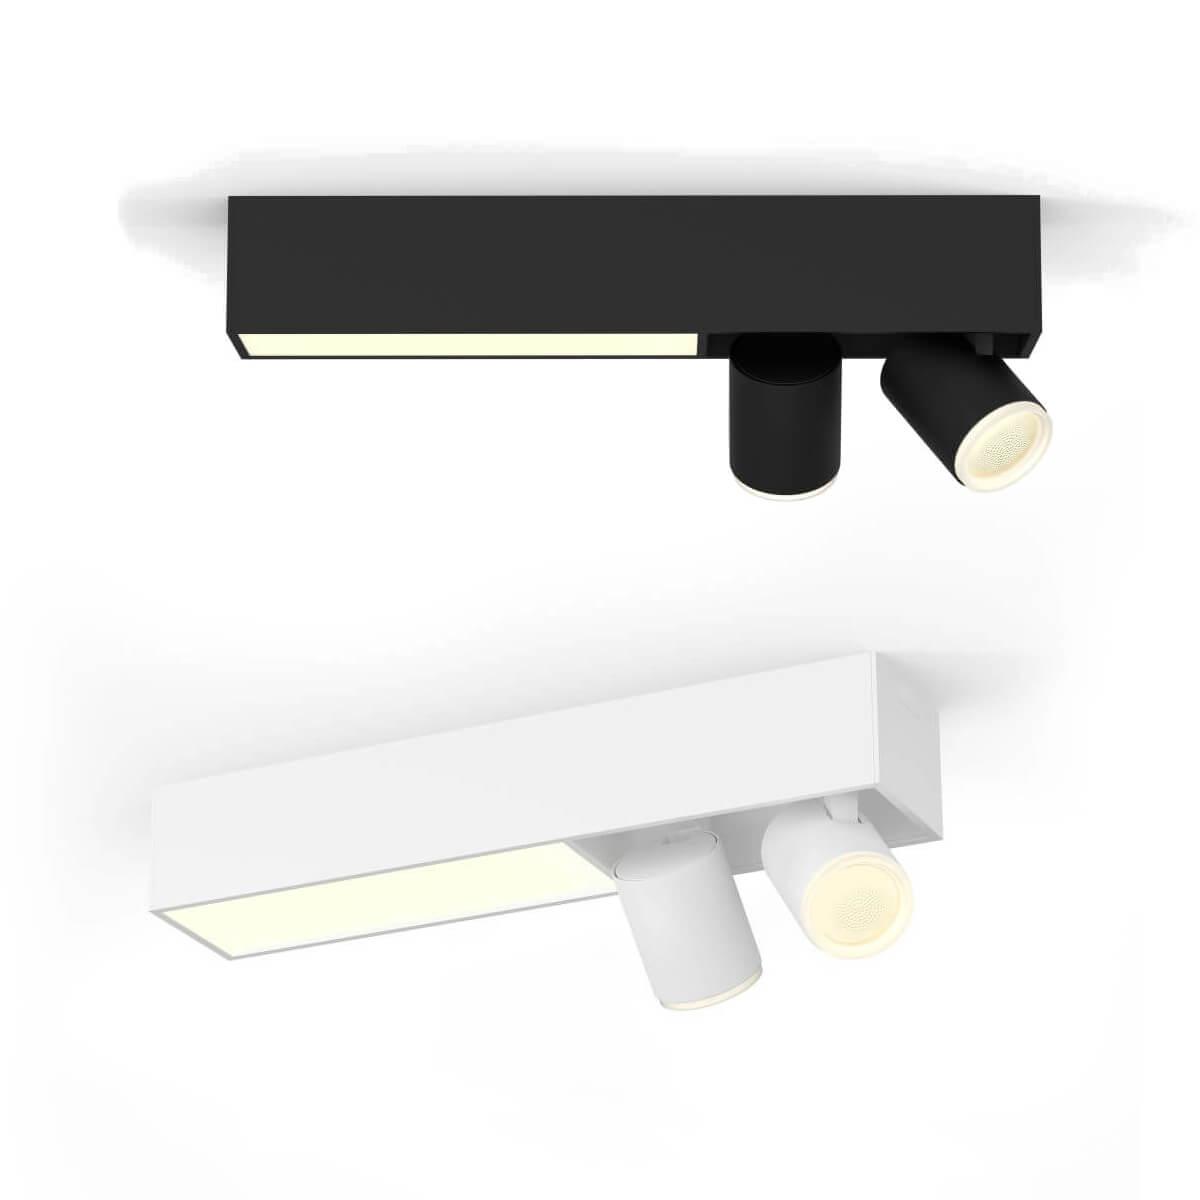 Philips Hue White & Color Ambiance Centris Strahler 2 flammig | Lightbar Spots | Schwarz oder weiß